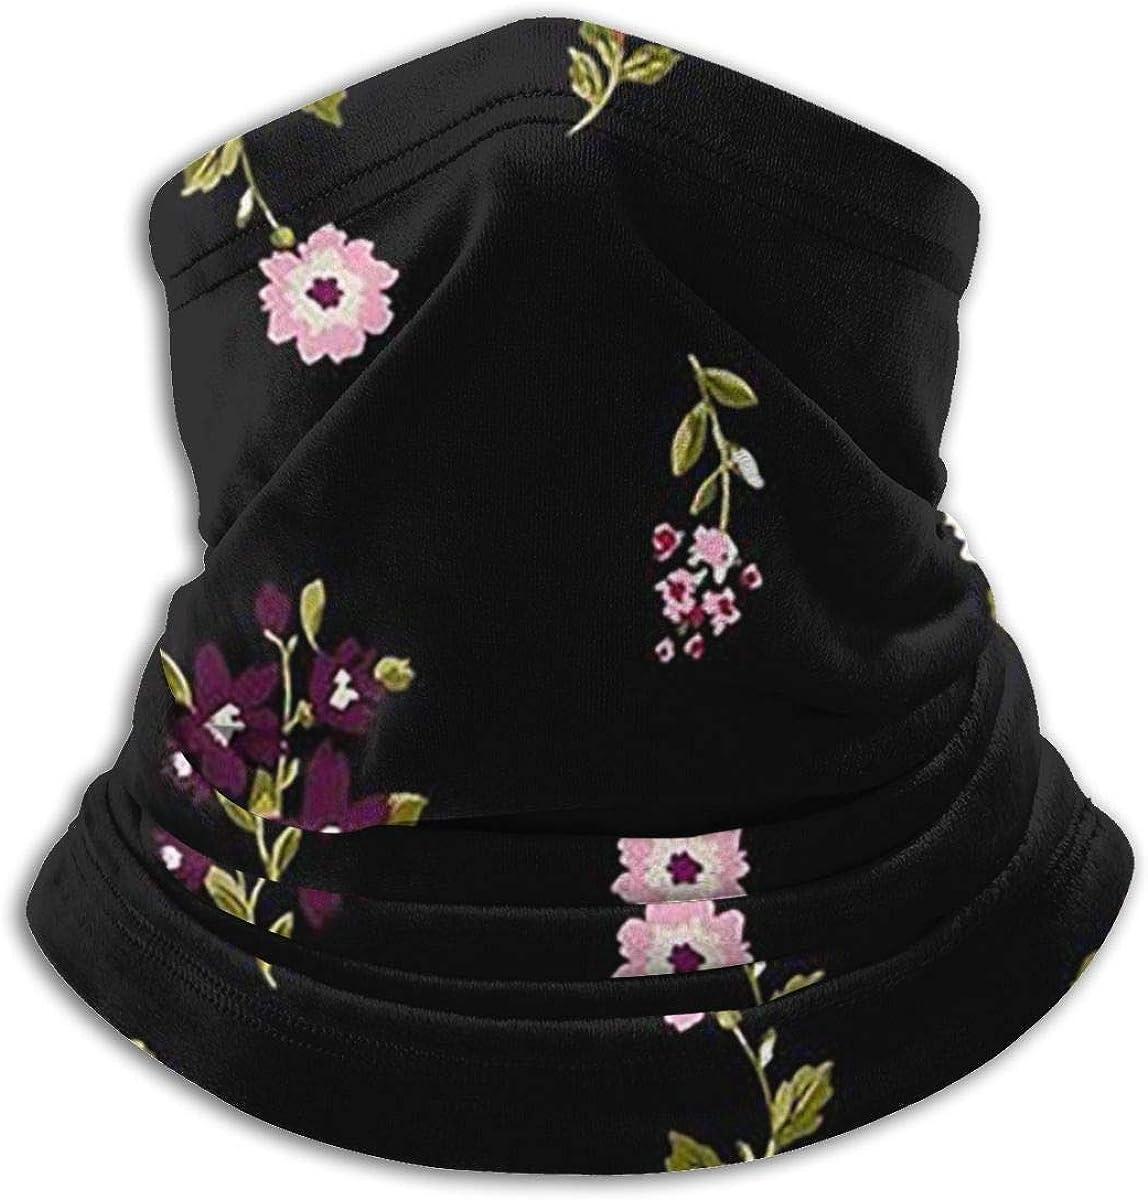 Floral Print Black Multi-function Neck Warmer Gaiter Polyester Neck Warmer Windproof Winter Neck Gaiter Cold Weather Scarf For Men Women